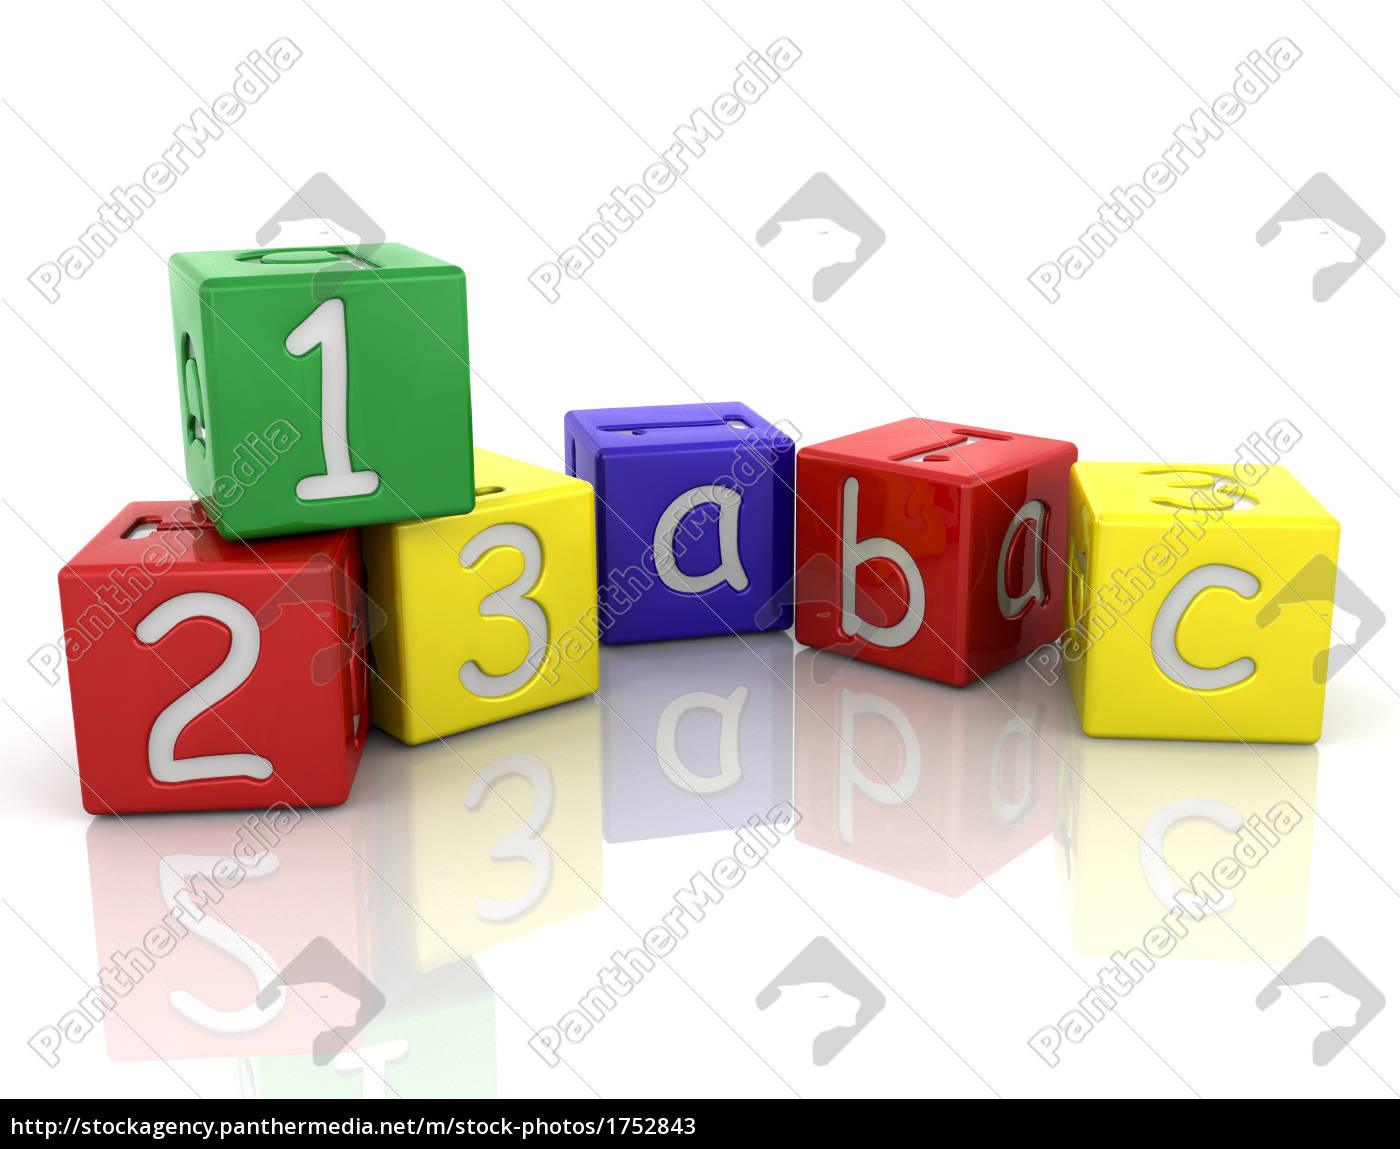 baby's, building, blocks - 1752843